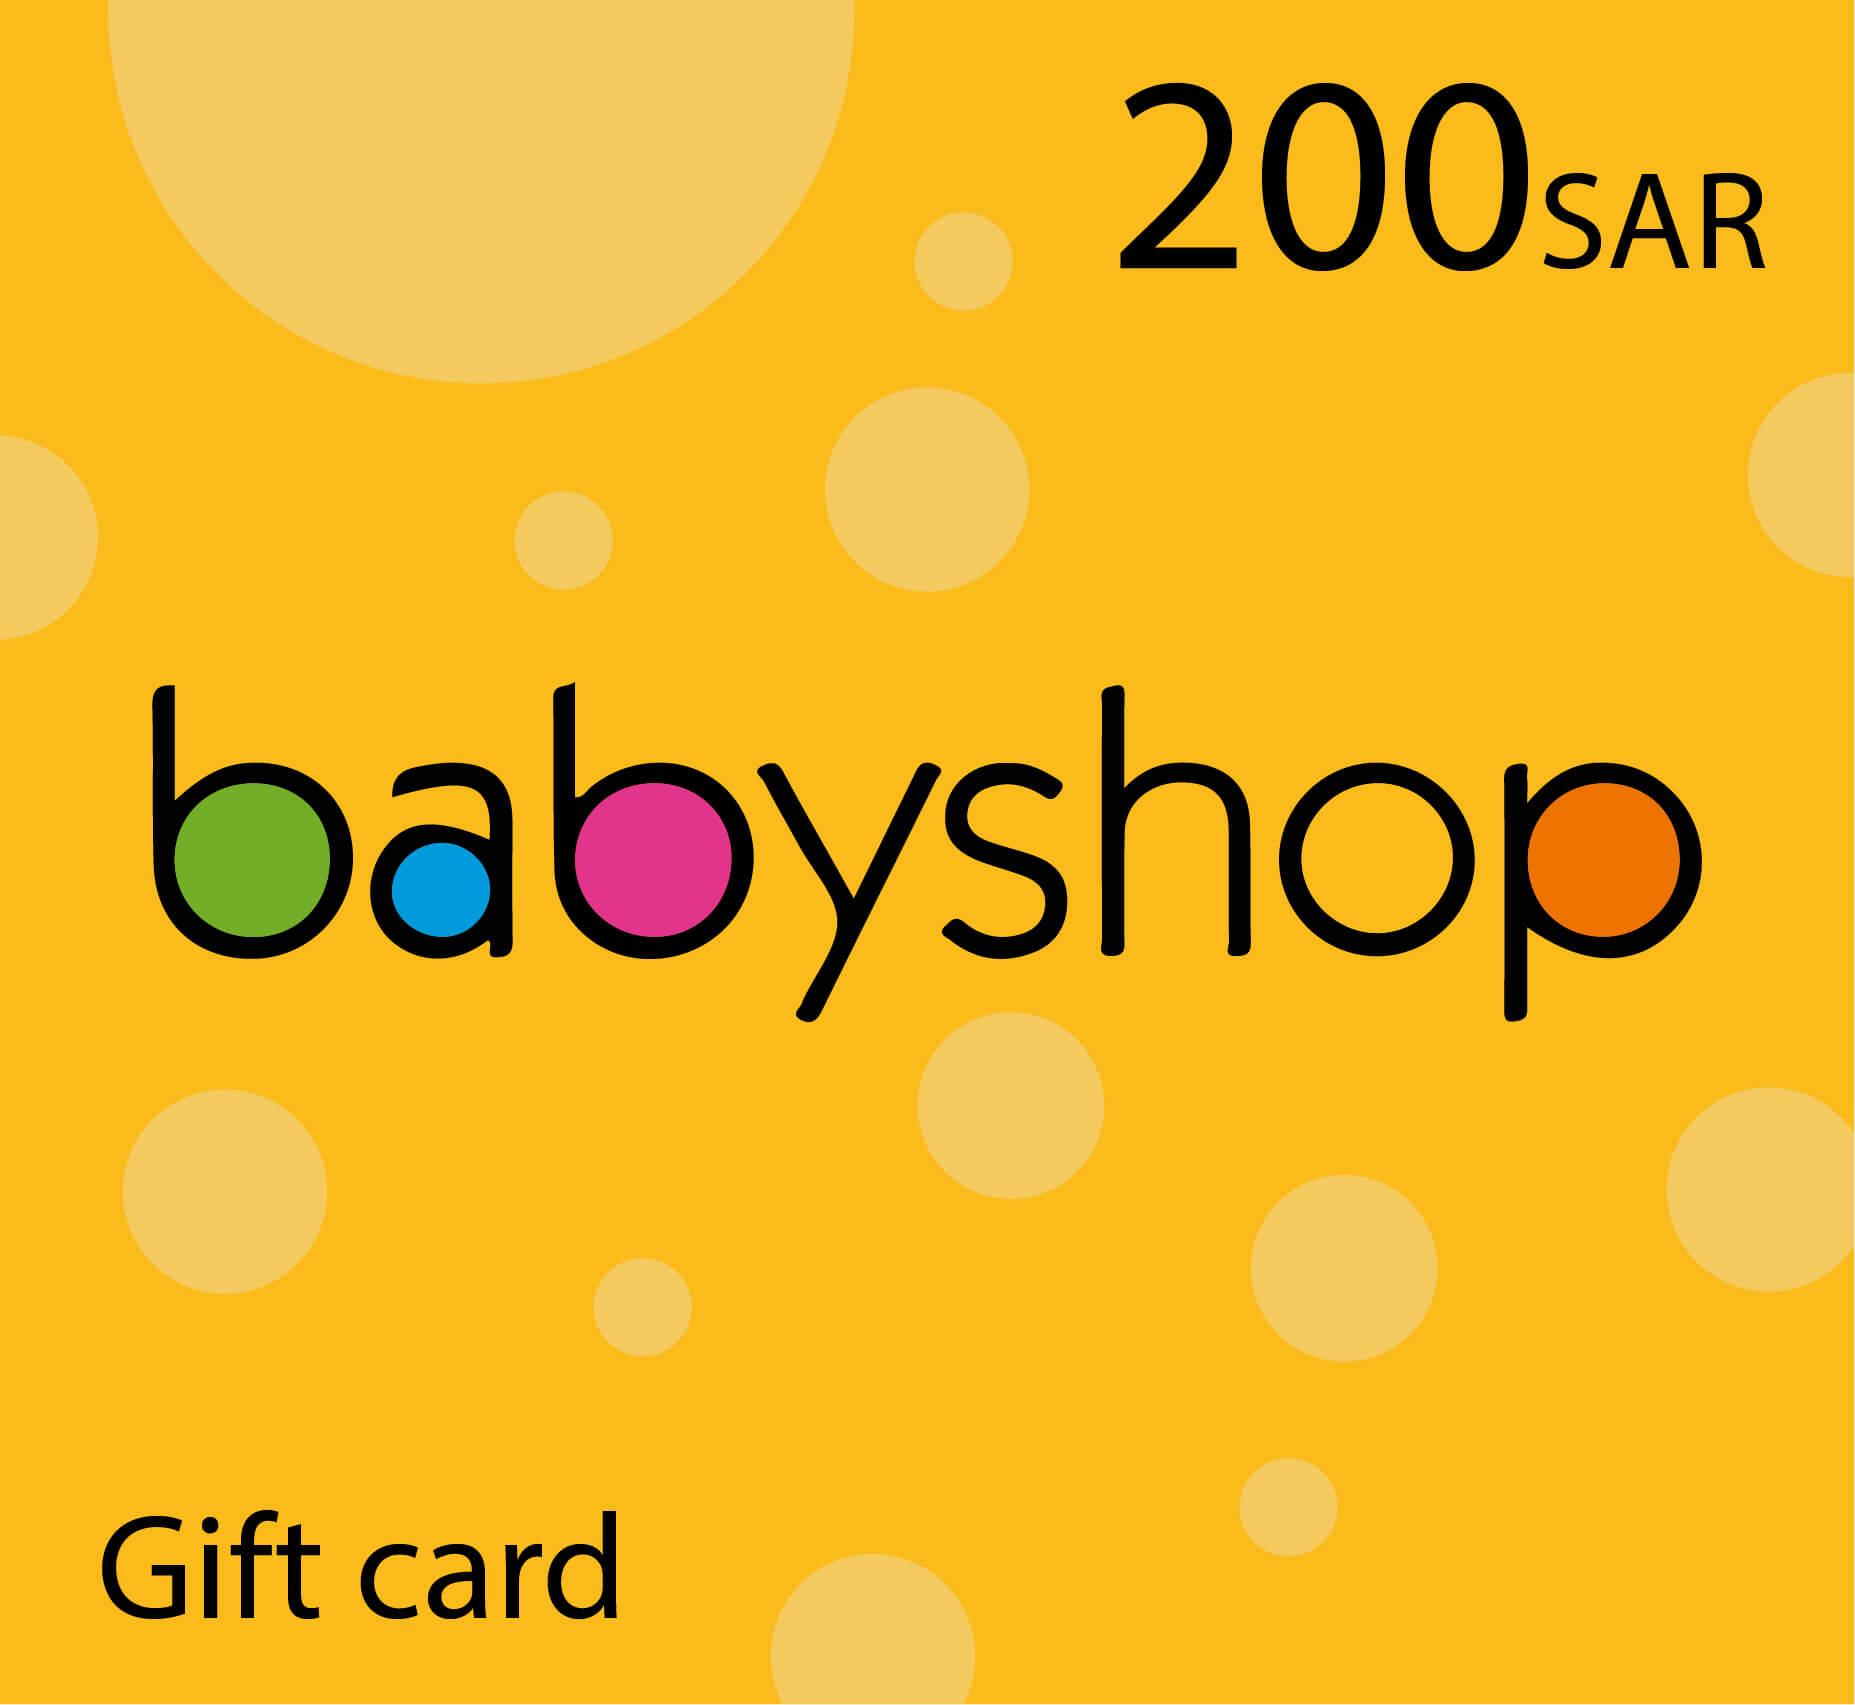 Baby Shop Gift Card - 200 SAR